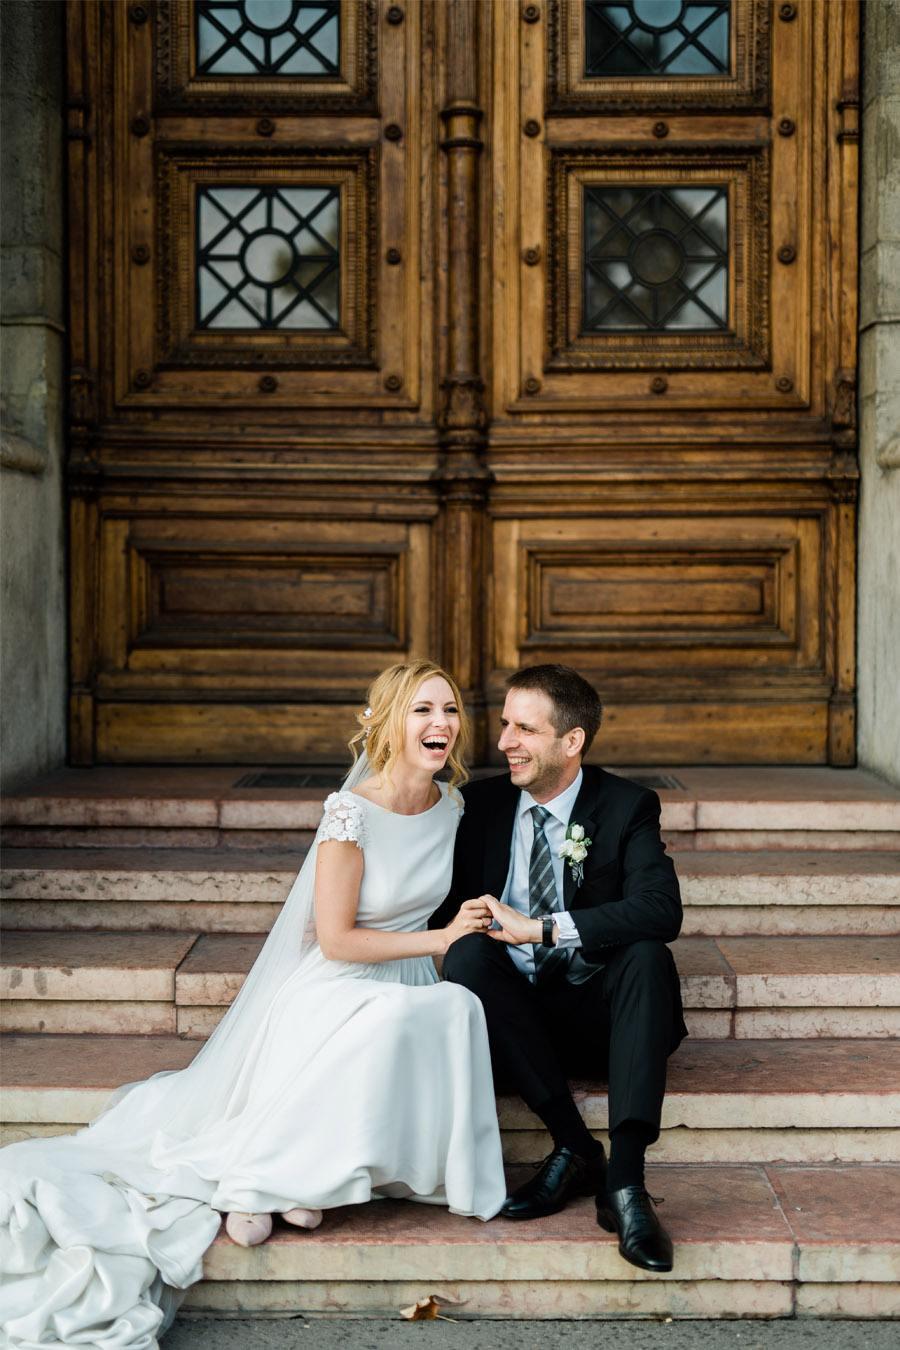 JULIO & ANITA: ROMÁNTICA BODA EN BUDAPEST reportaje-boda